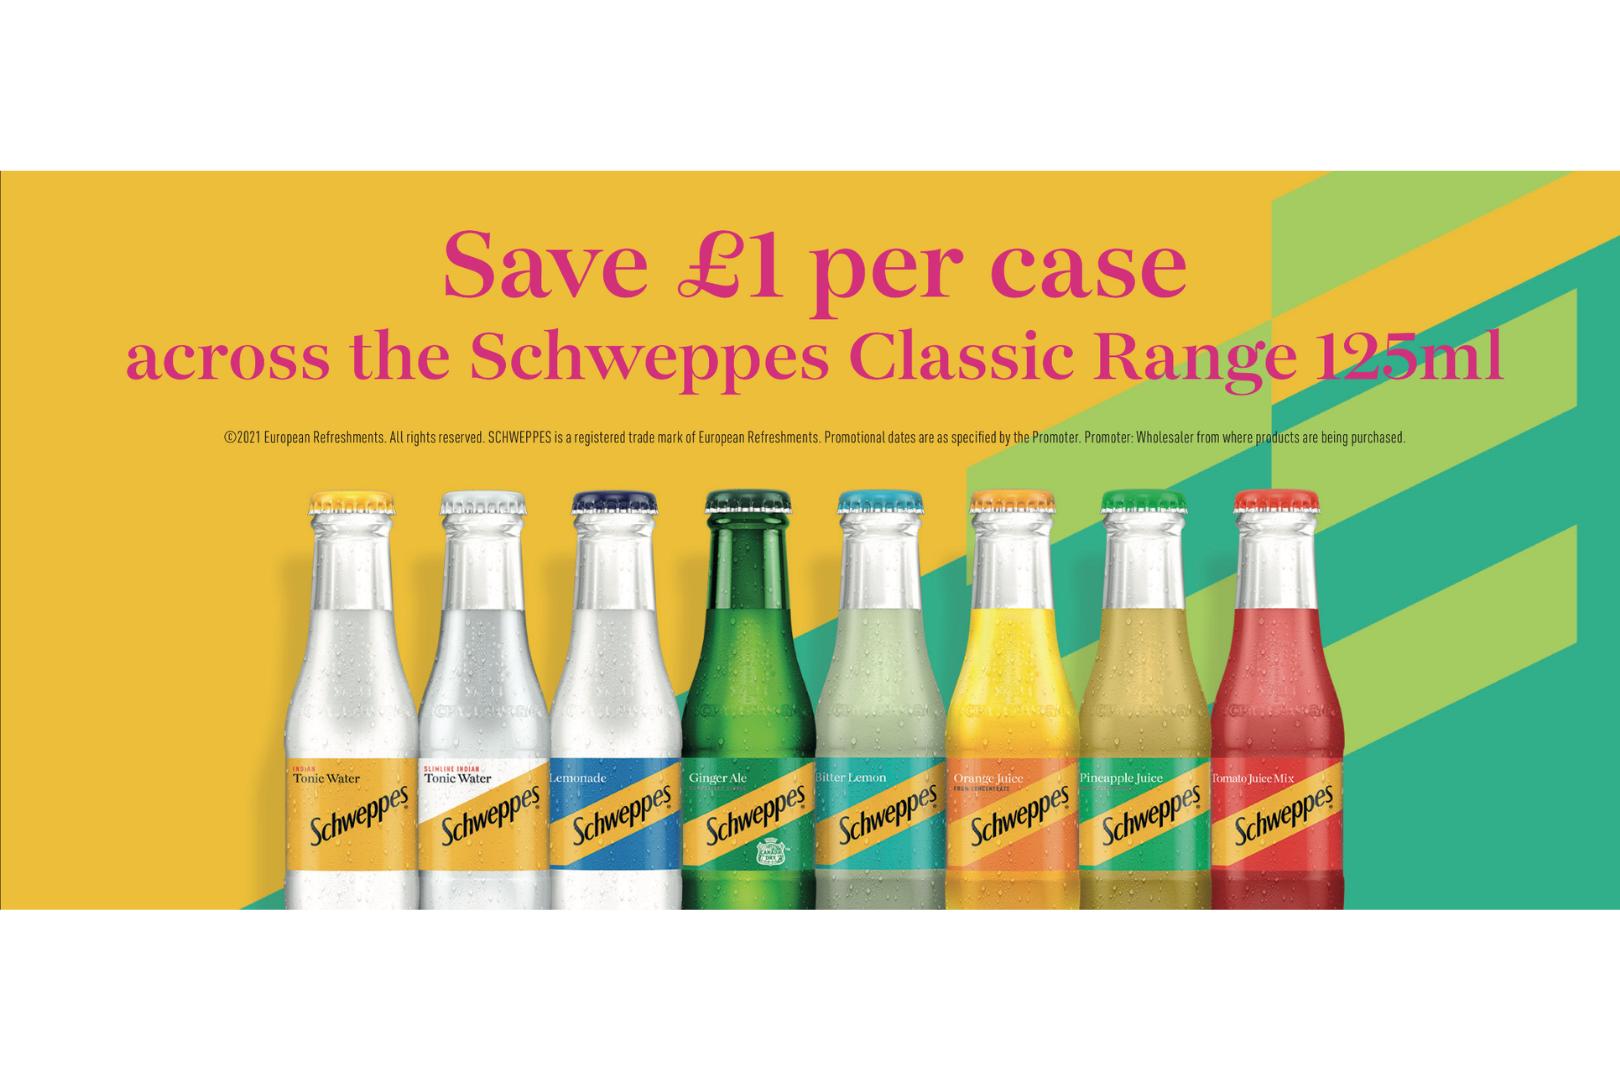 Schweppes Classic Range 125ml